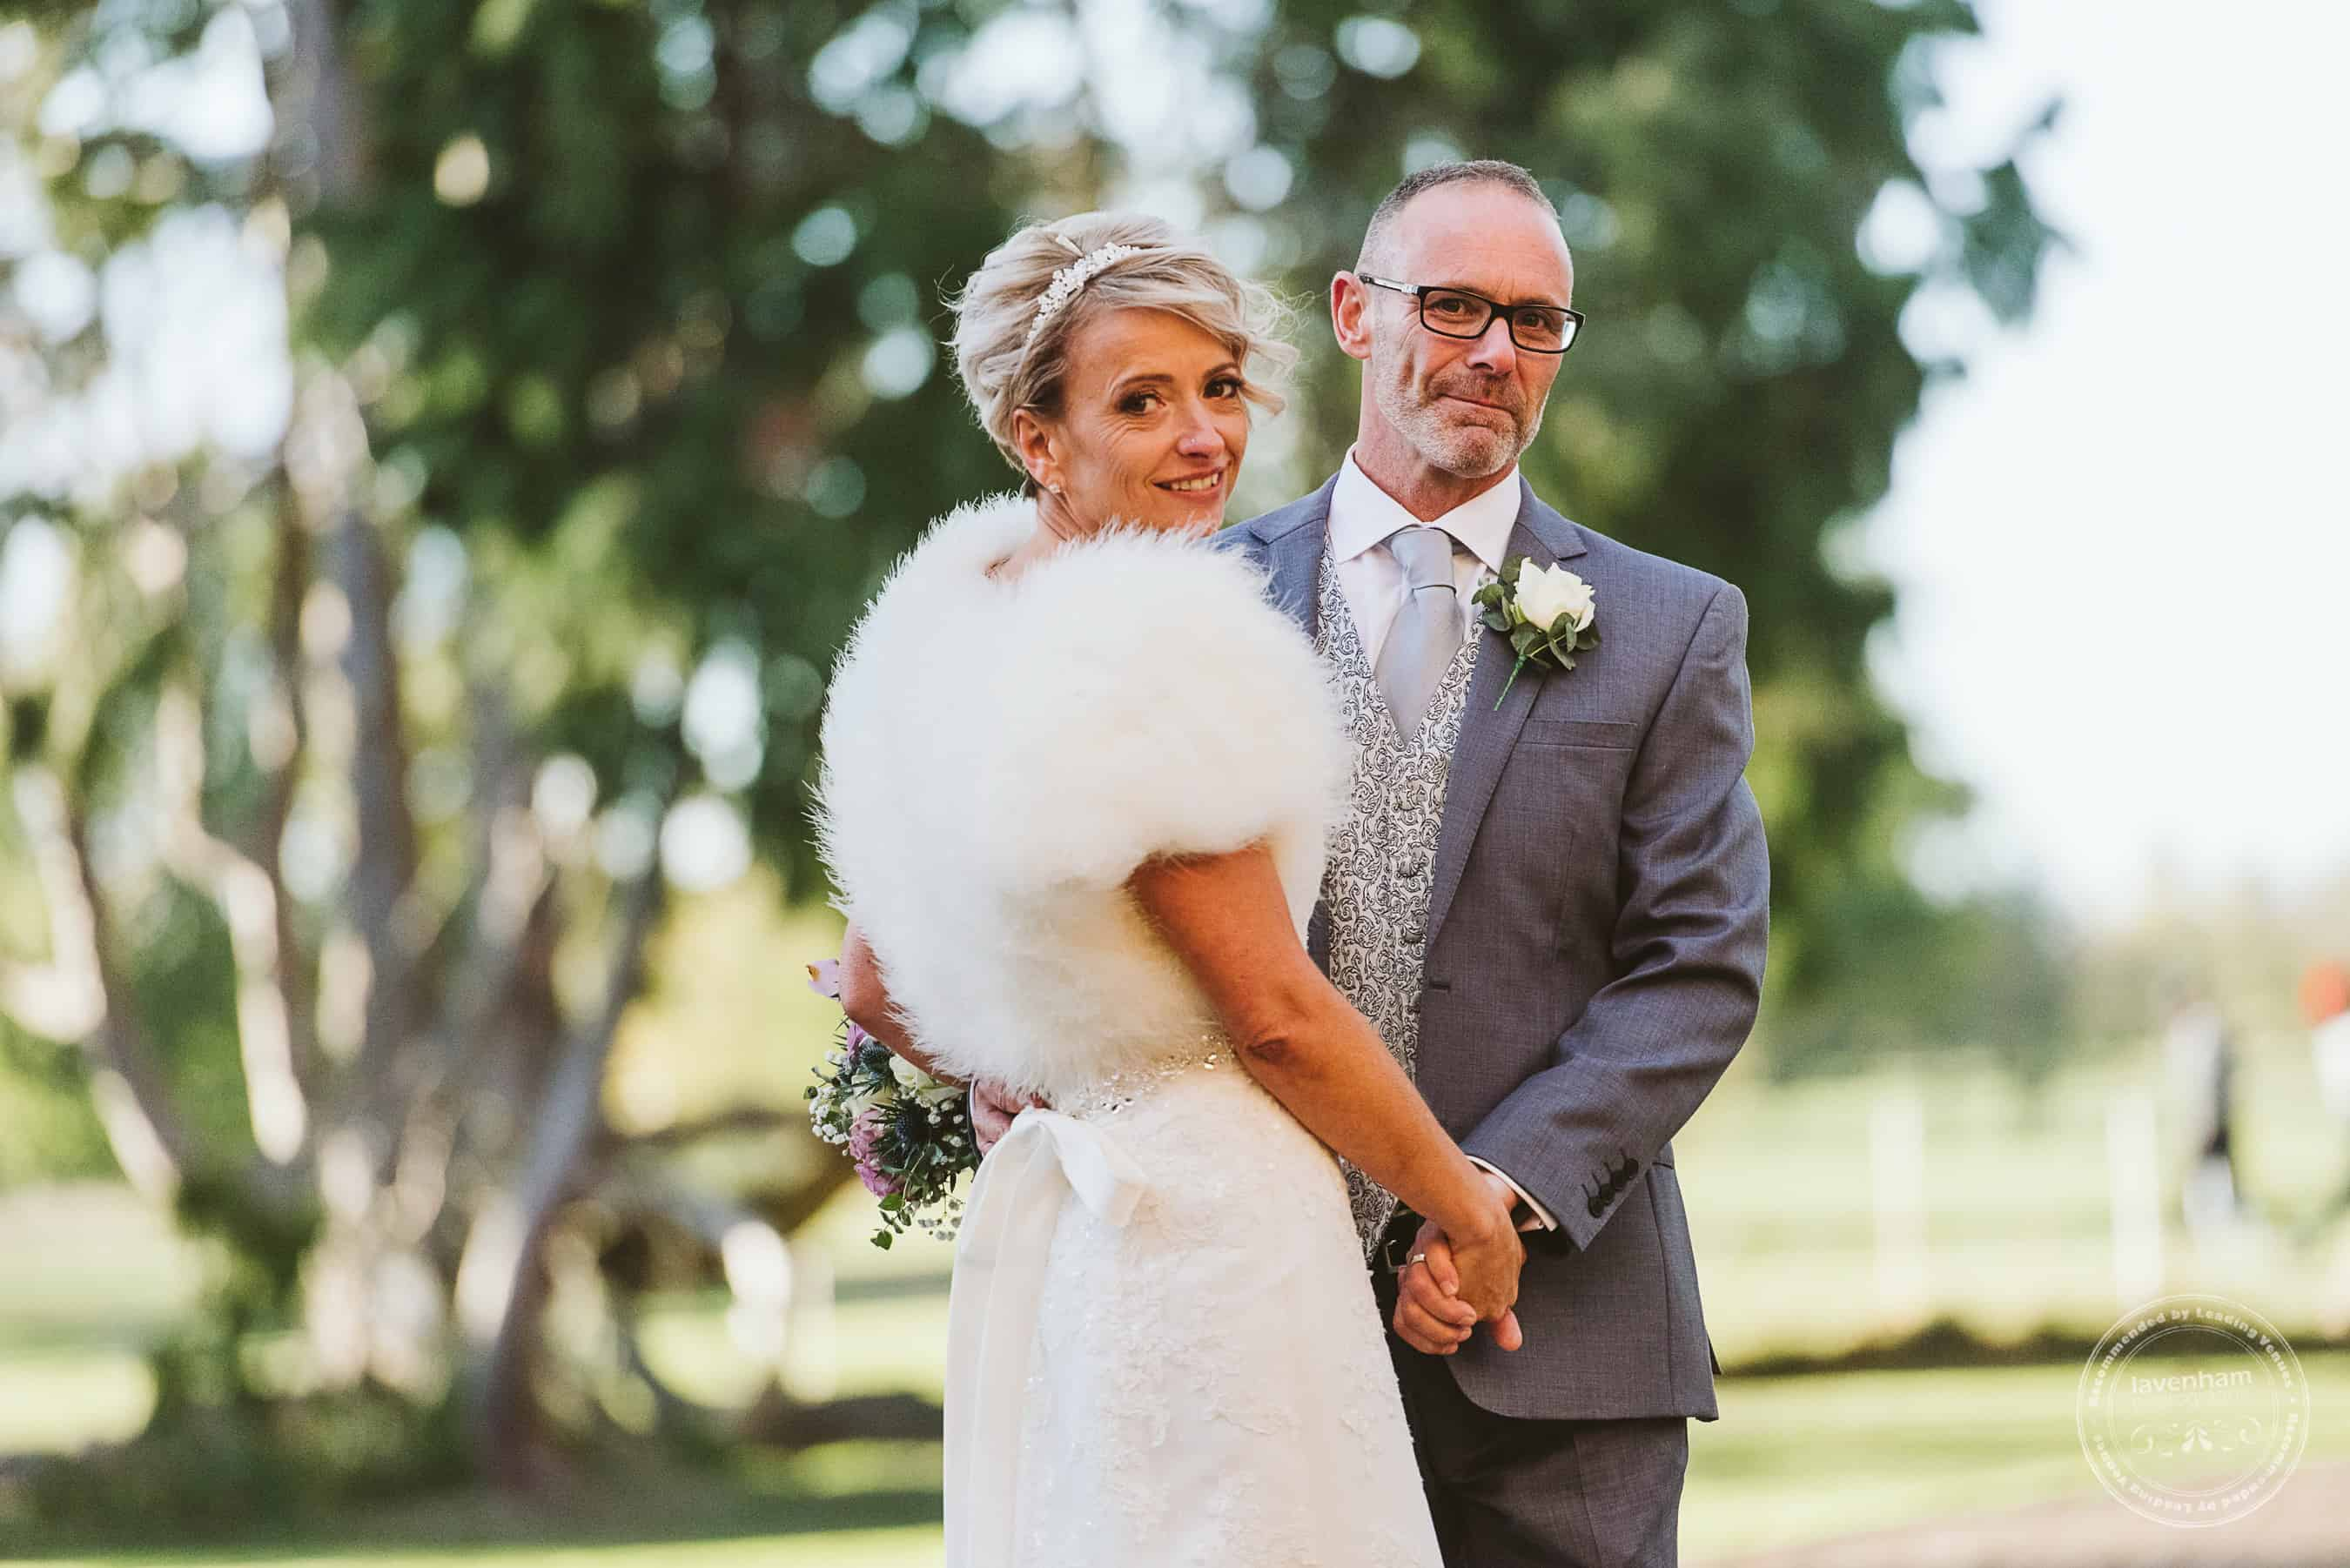 281018 Gosfield Hall Wedding Photography Lavenham Photographic 082